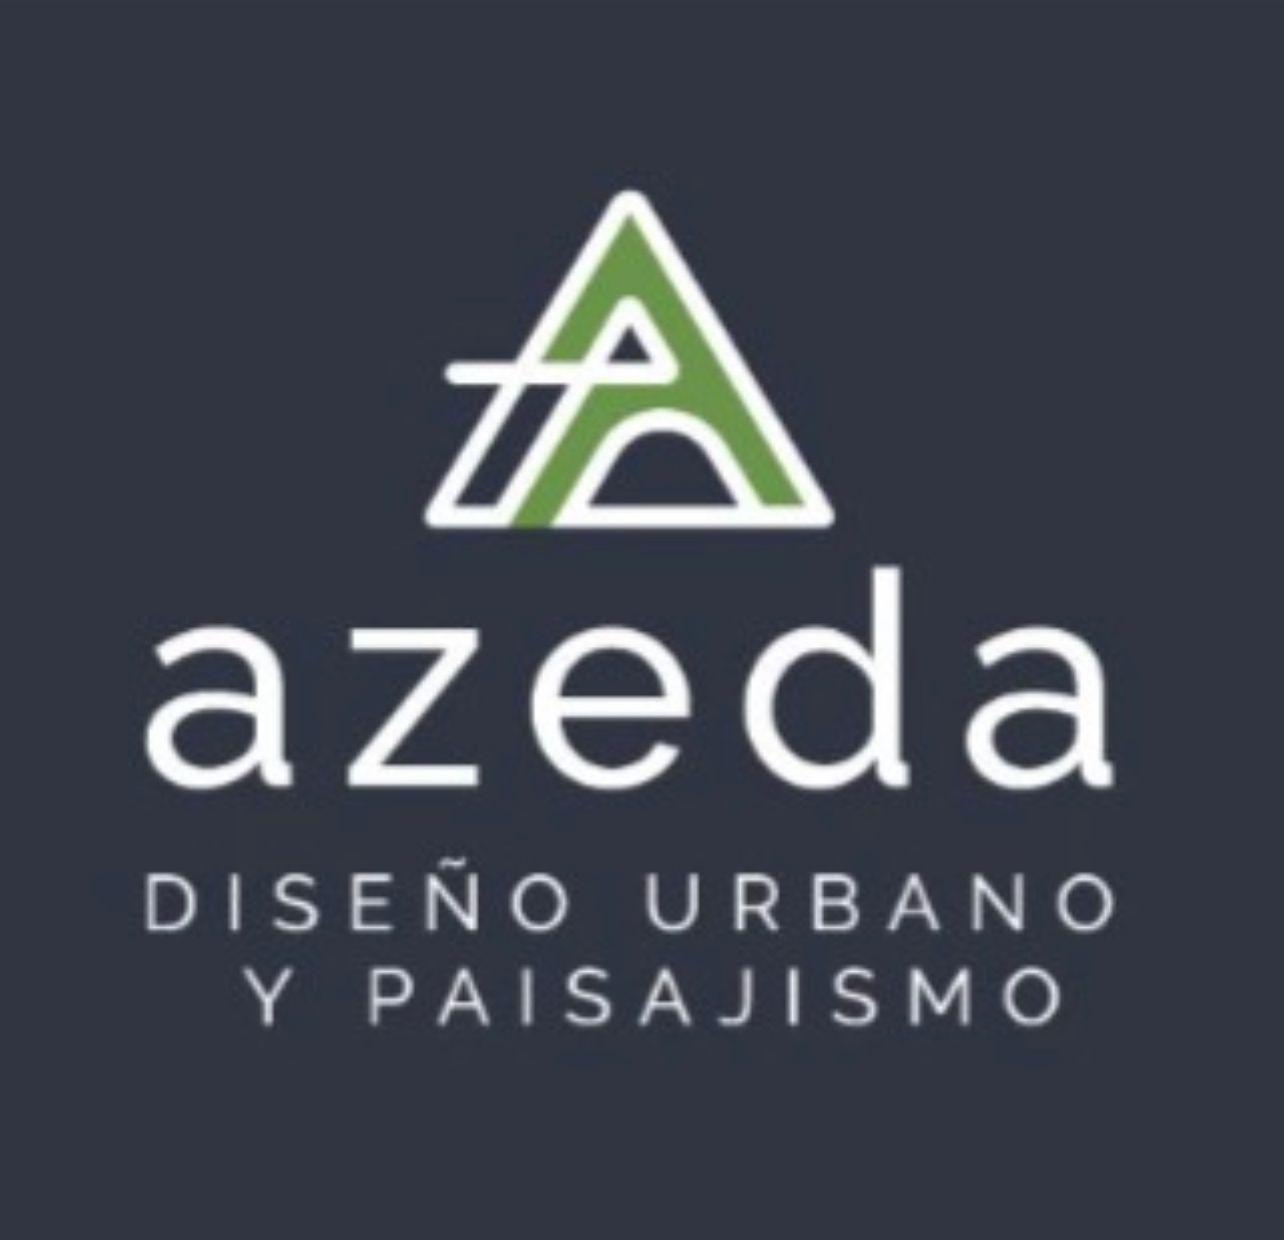 azeda diseño urbano